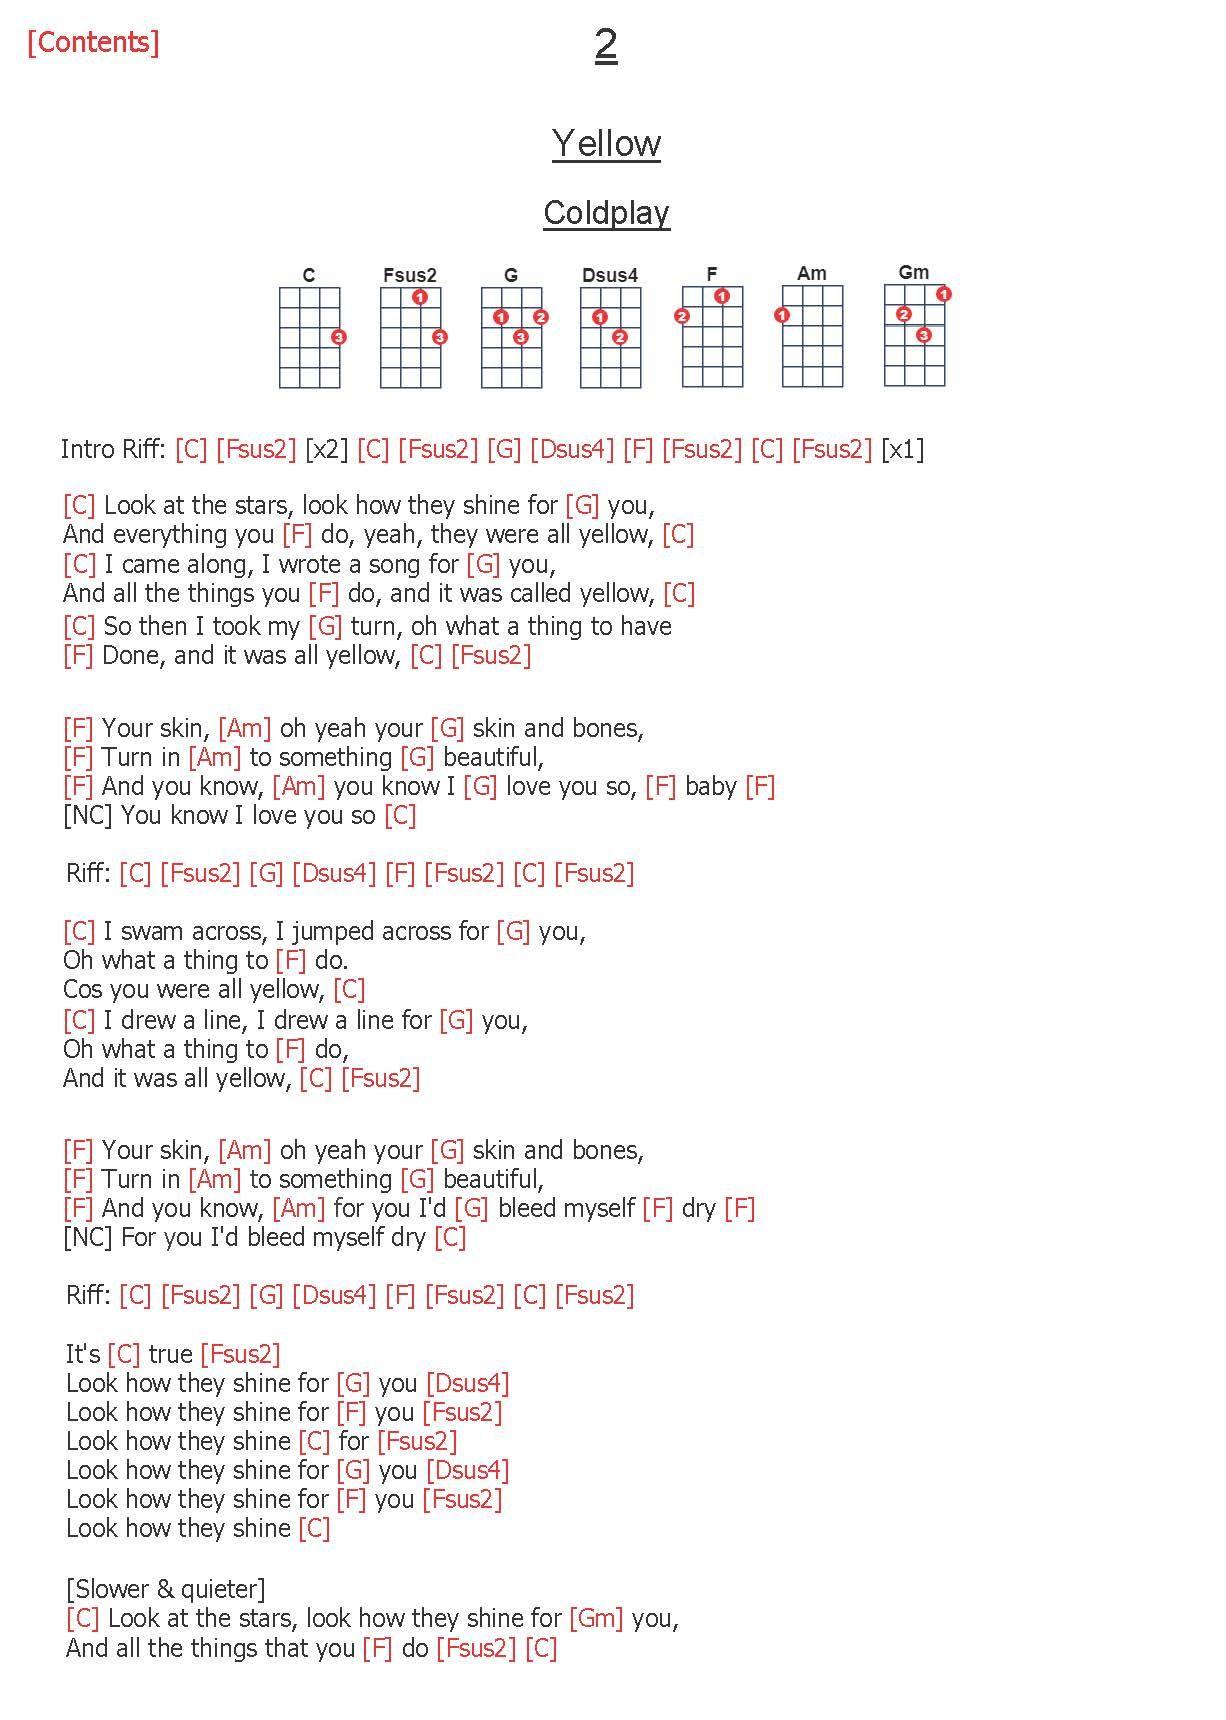 2 Yellow Coldplay Ukelele Chords Ukulele Songs Ukulele Chords Songs Ukulele Songs